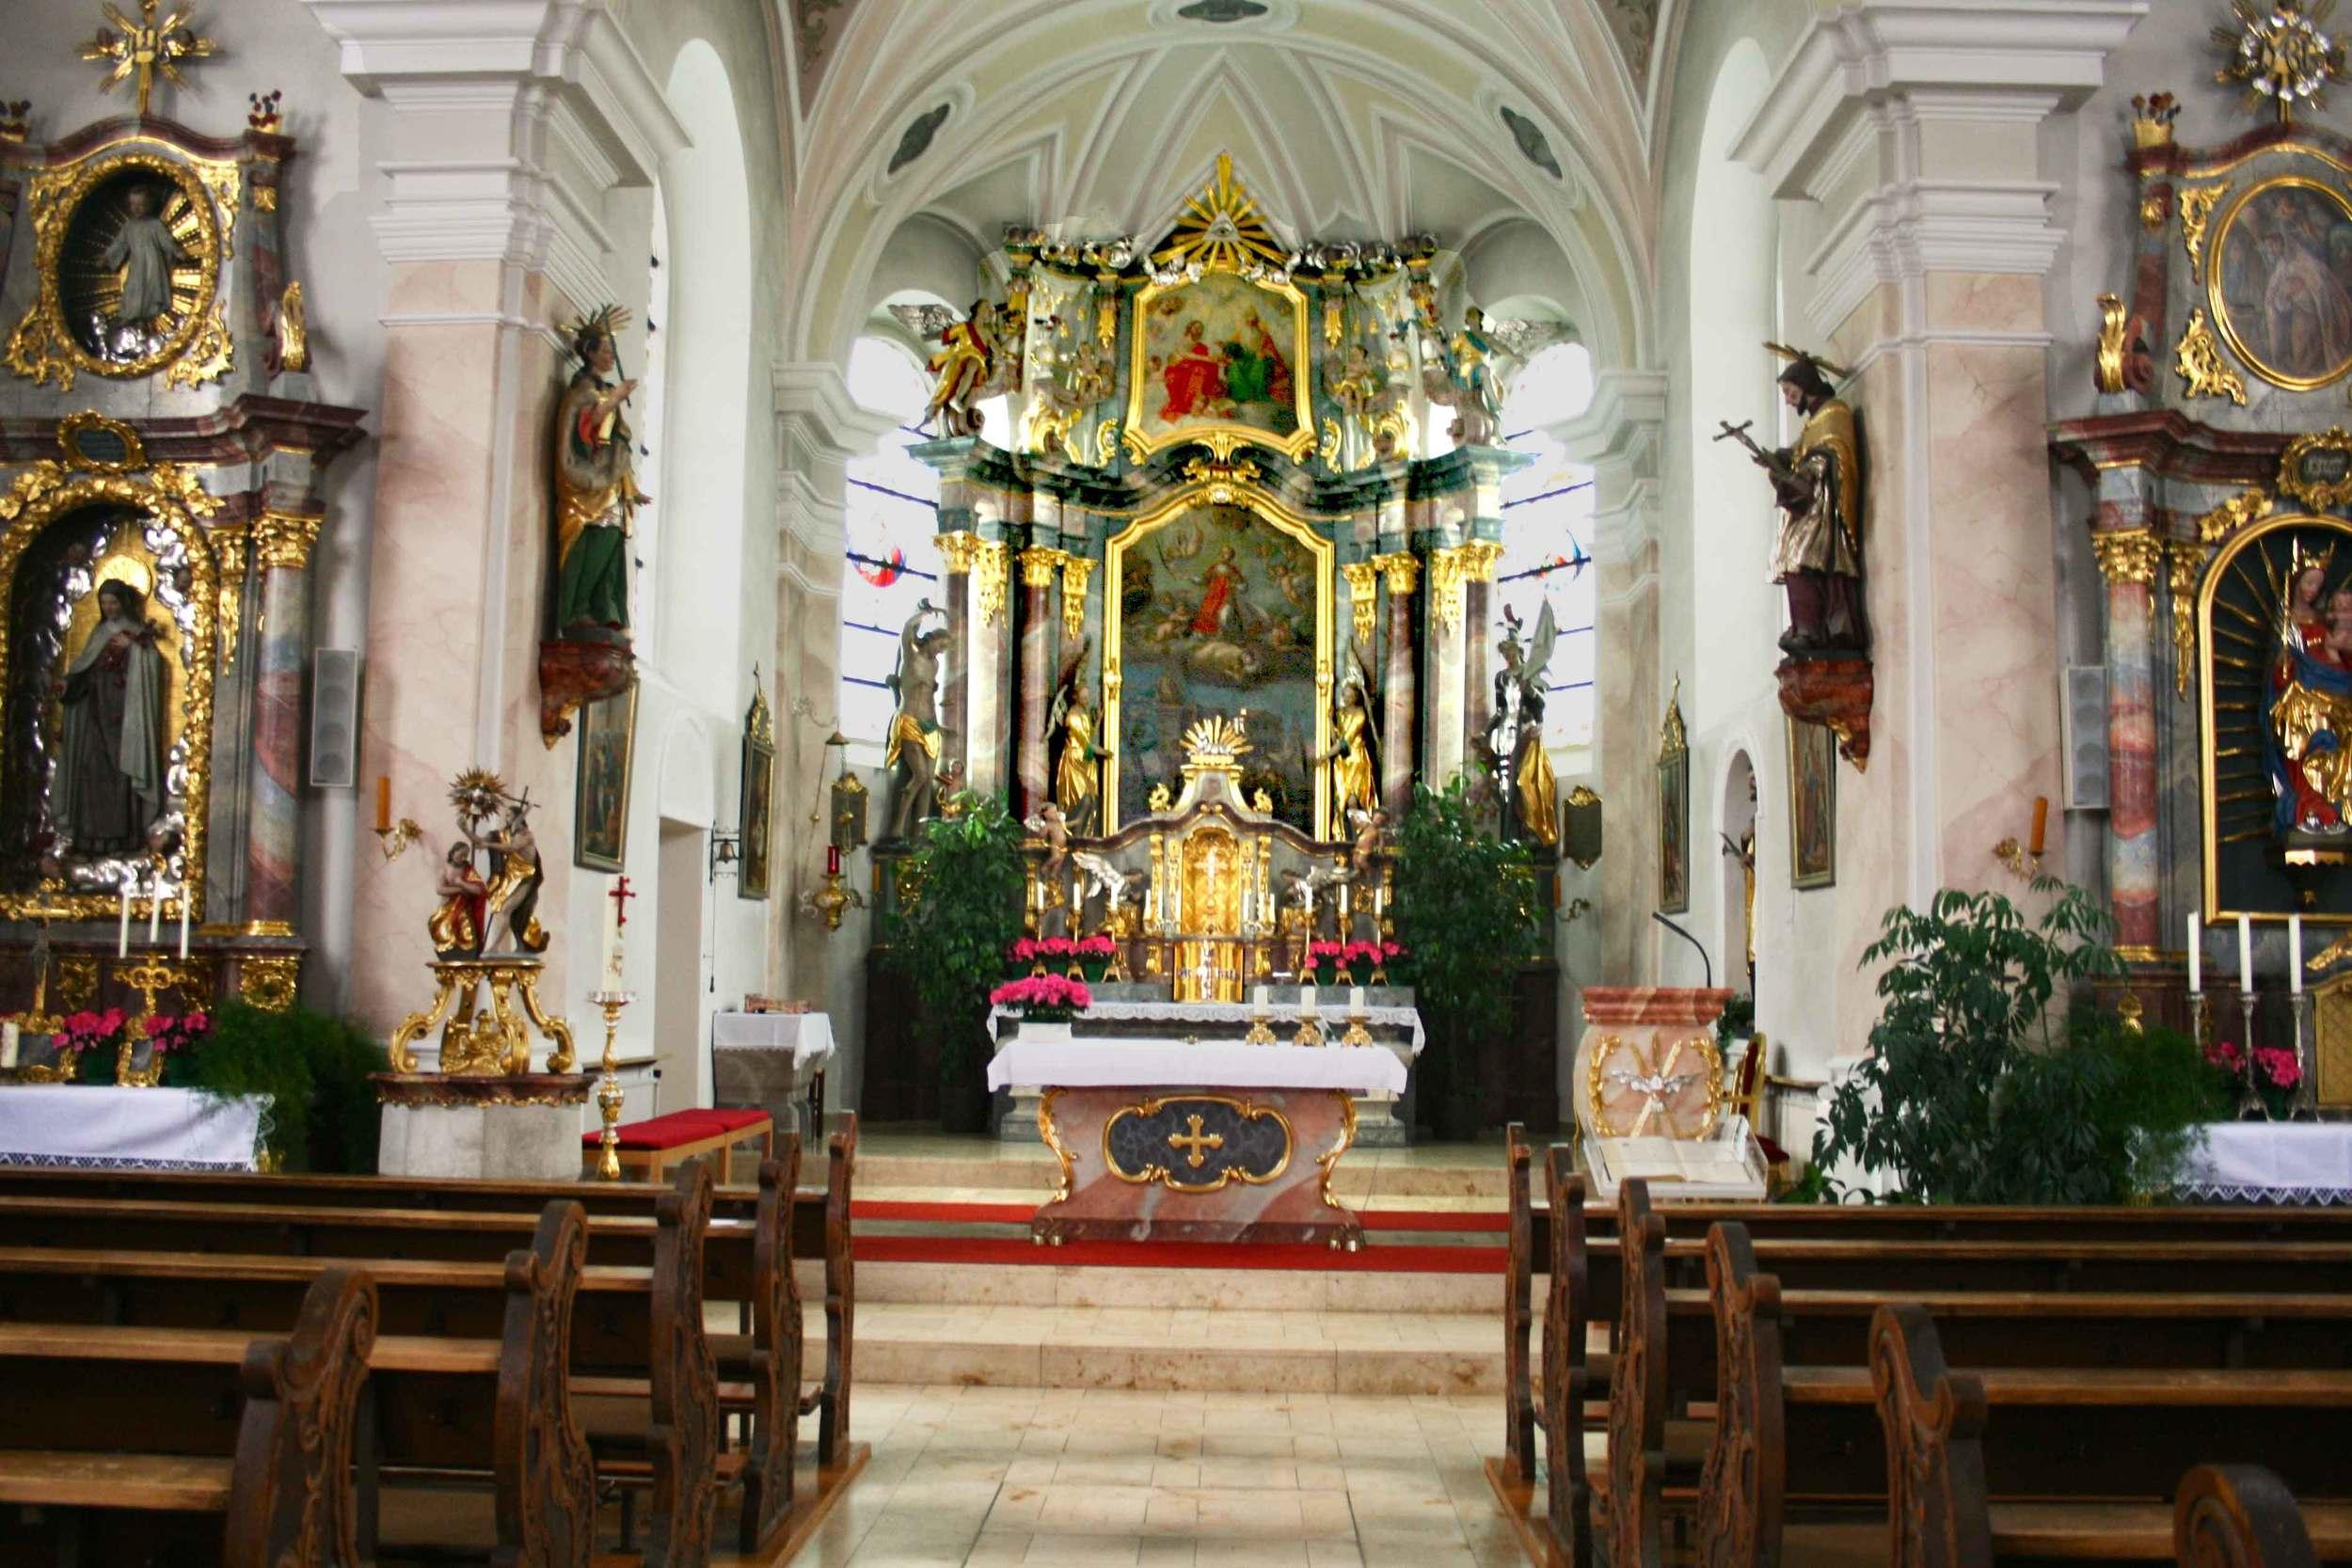 Chapel,Konnesreuth,Germany. Image©thingstodot.com